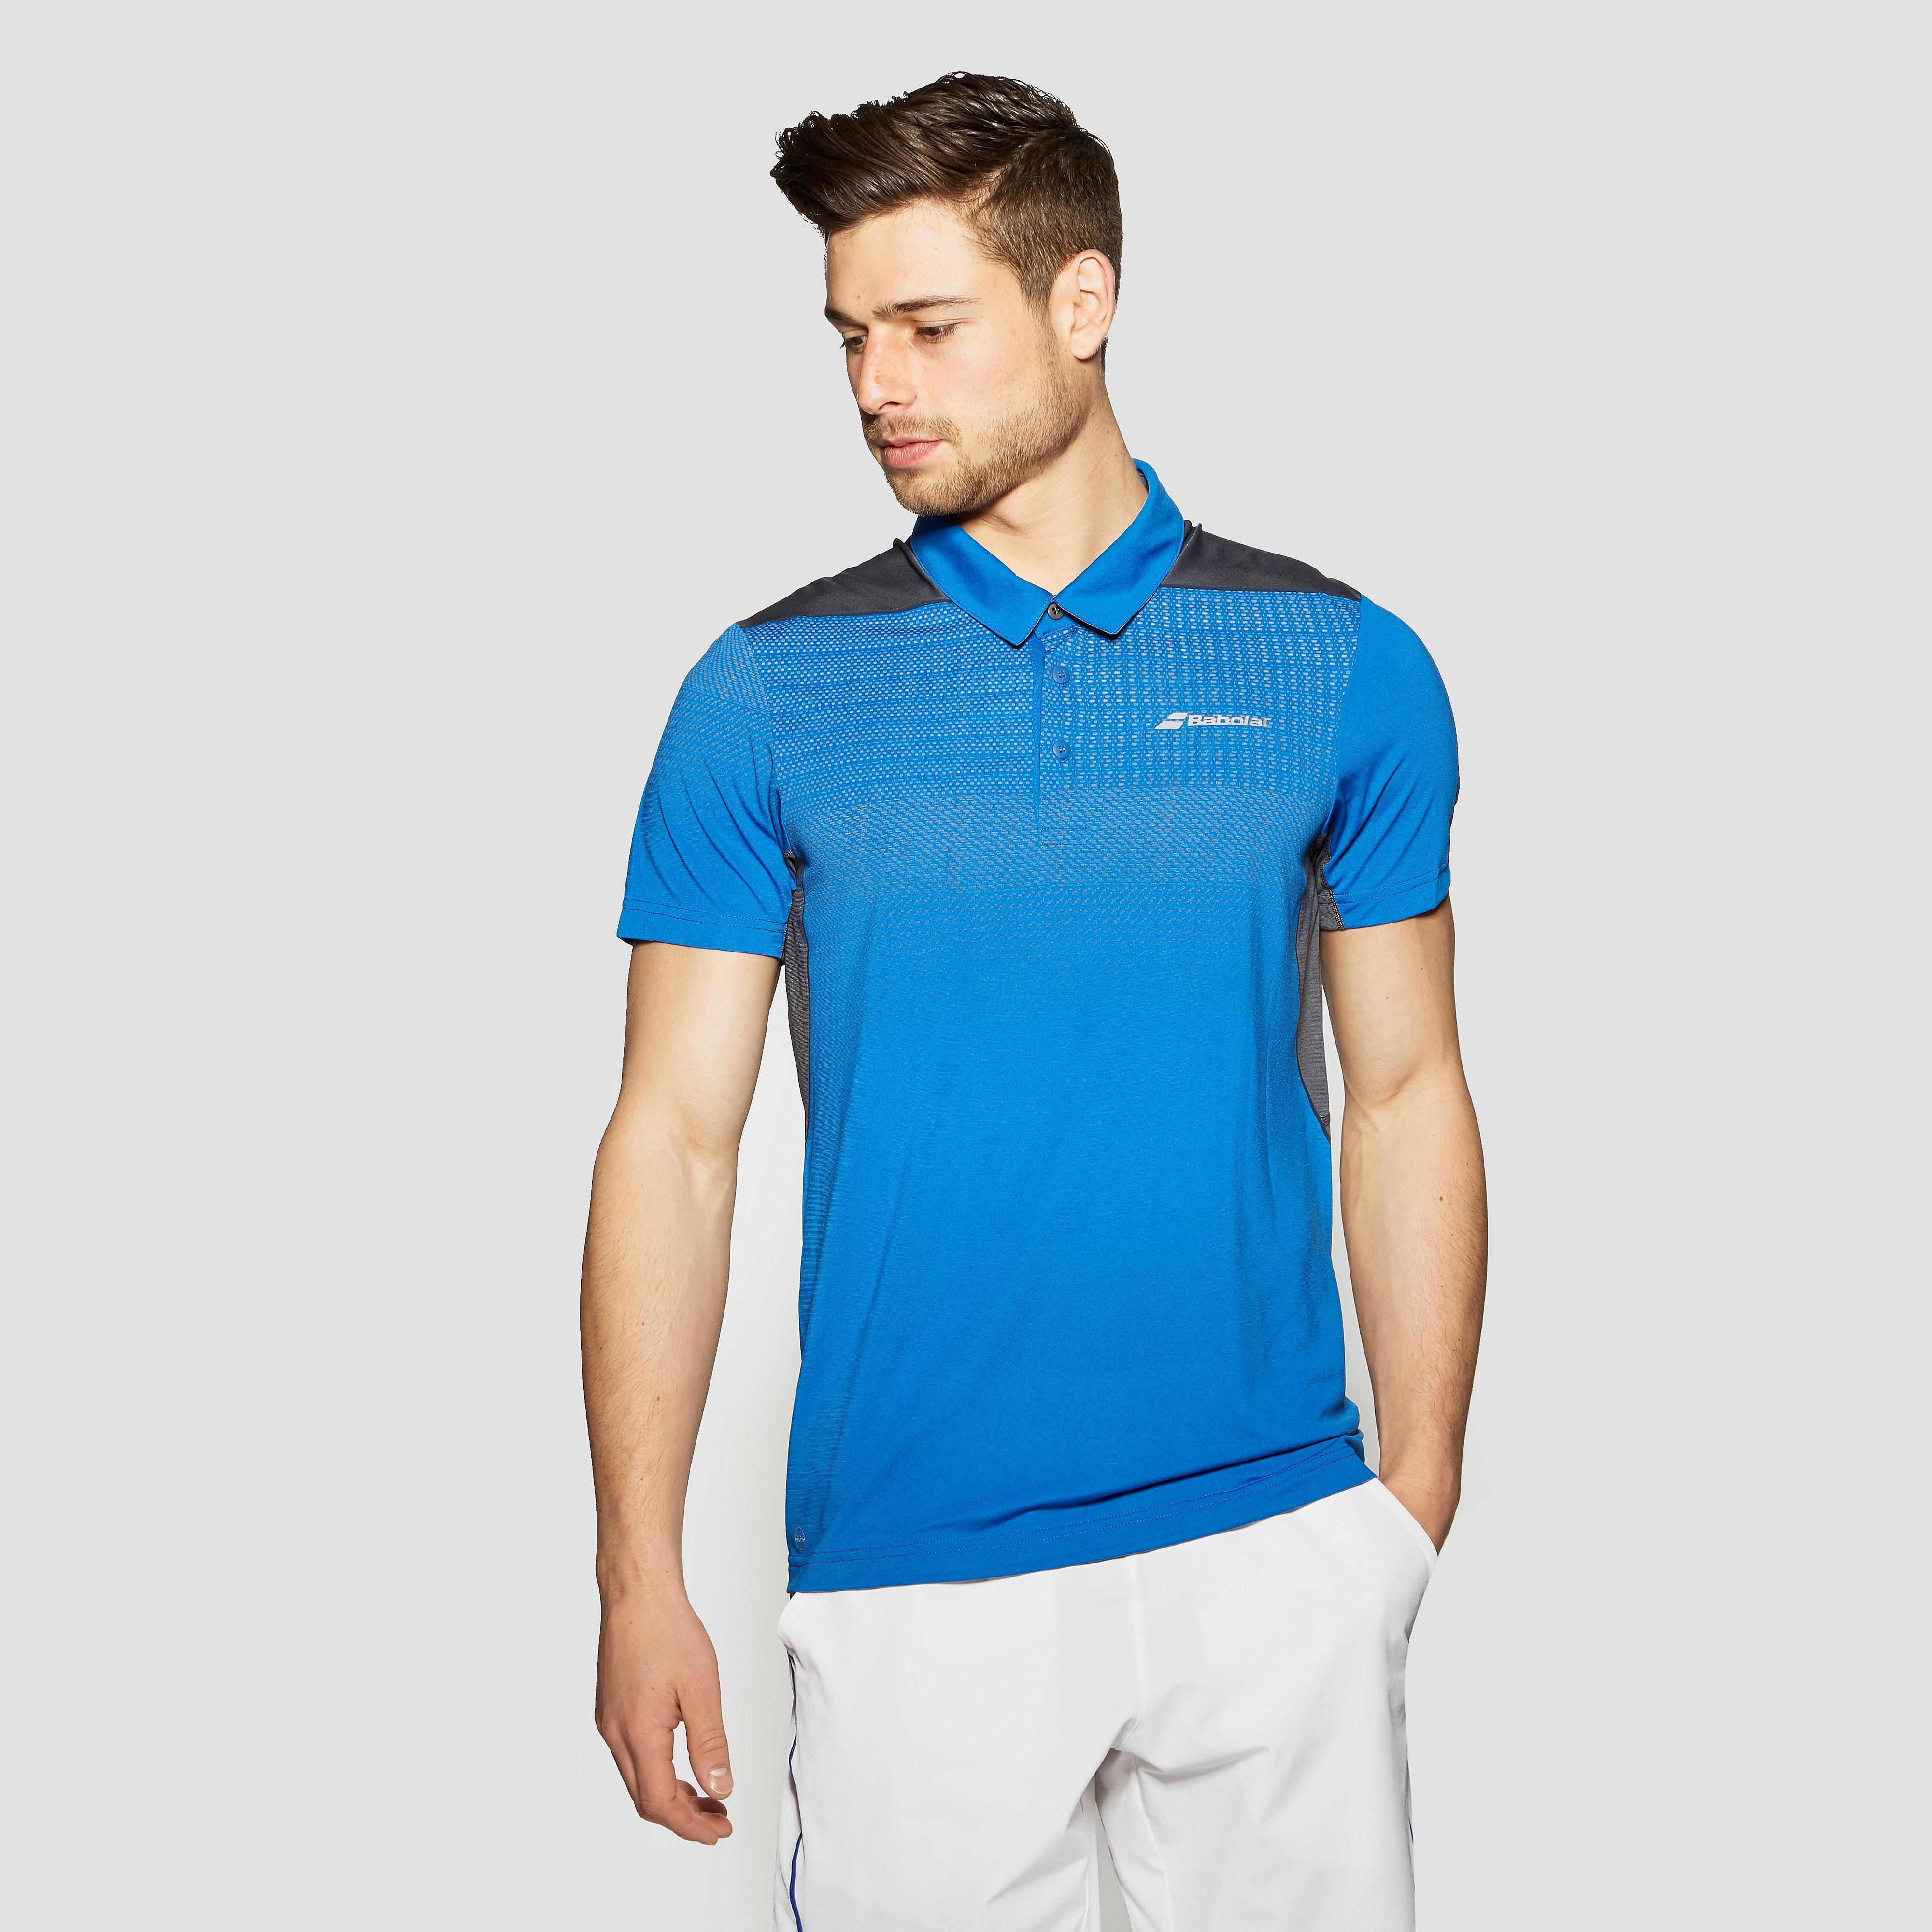 Babolat Performance Men's Polo Shirt